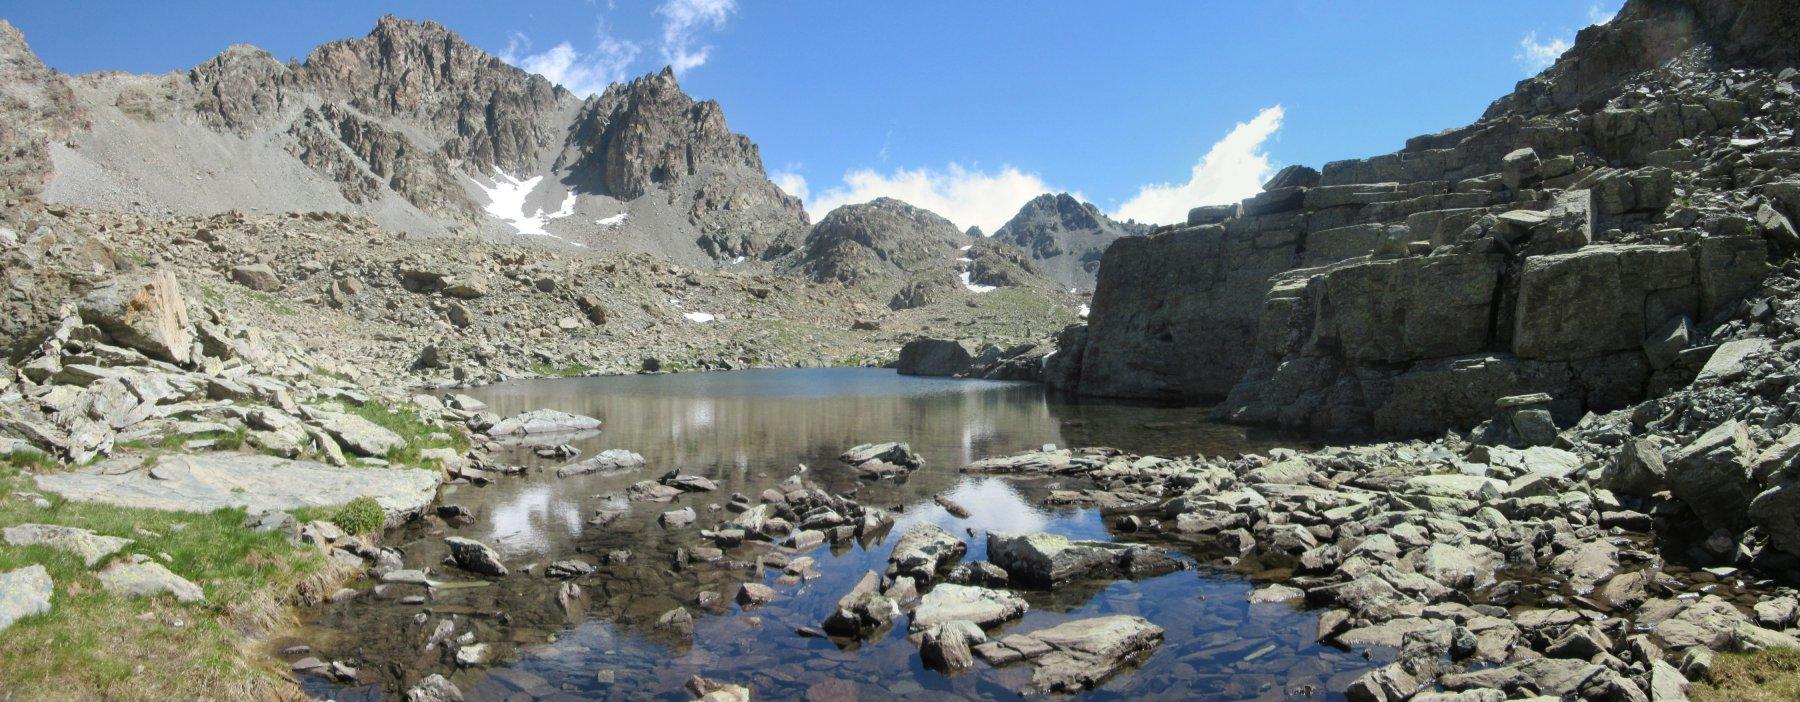 Lago Bertin